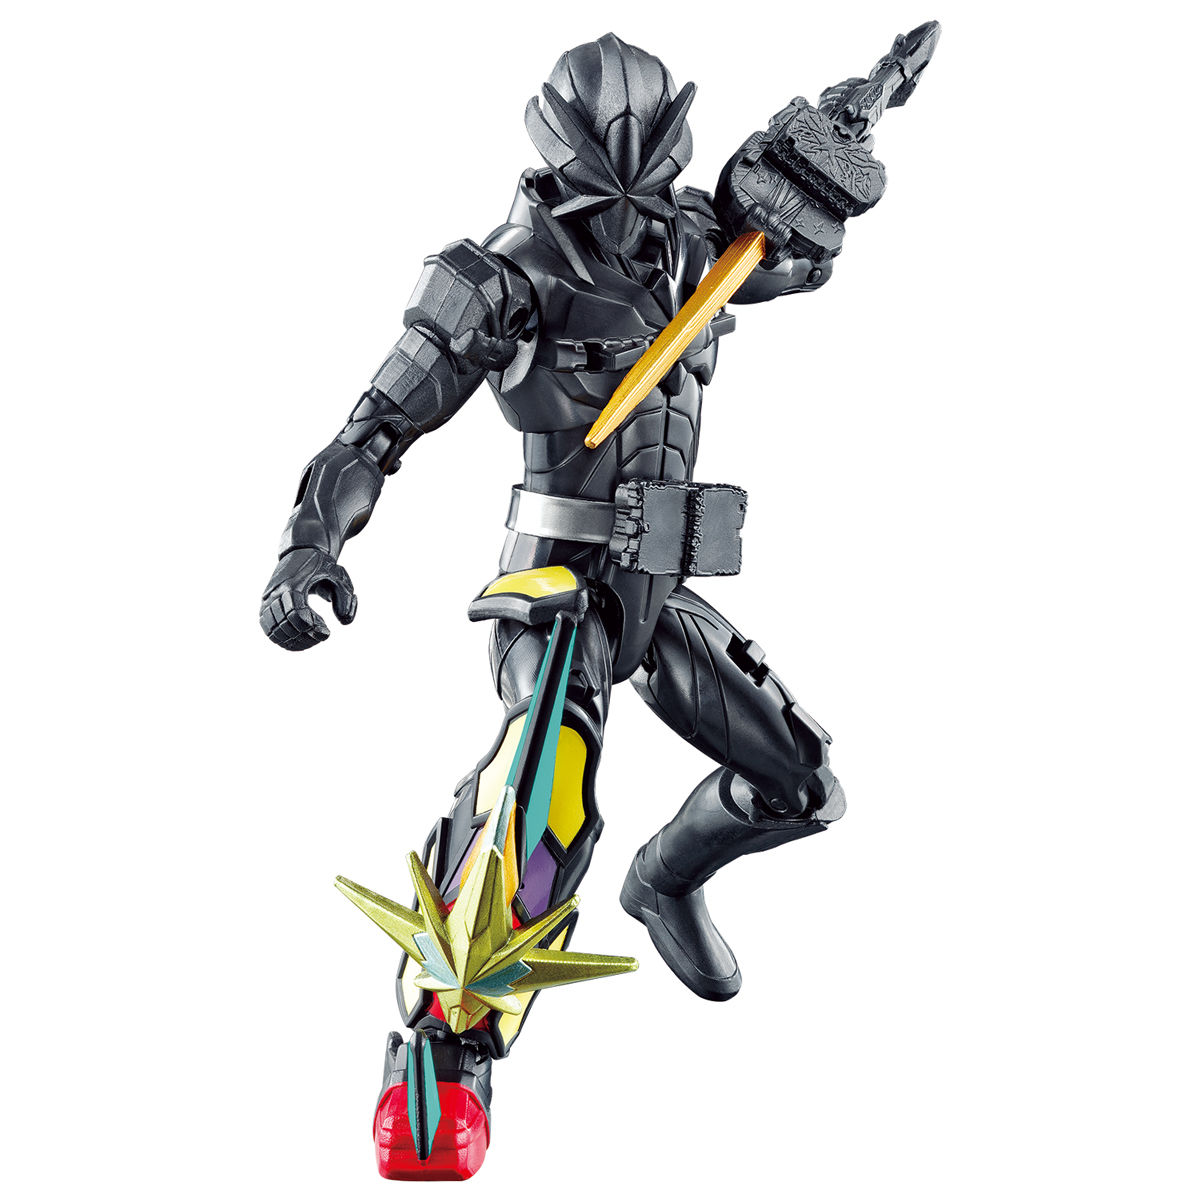 RKF『仮面ライダー最光 最高パーフェクトセット』仮面ライダーセイバー 可変可動フィギュア-001